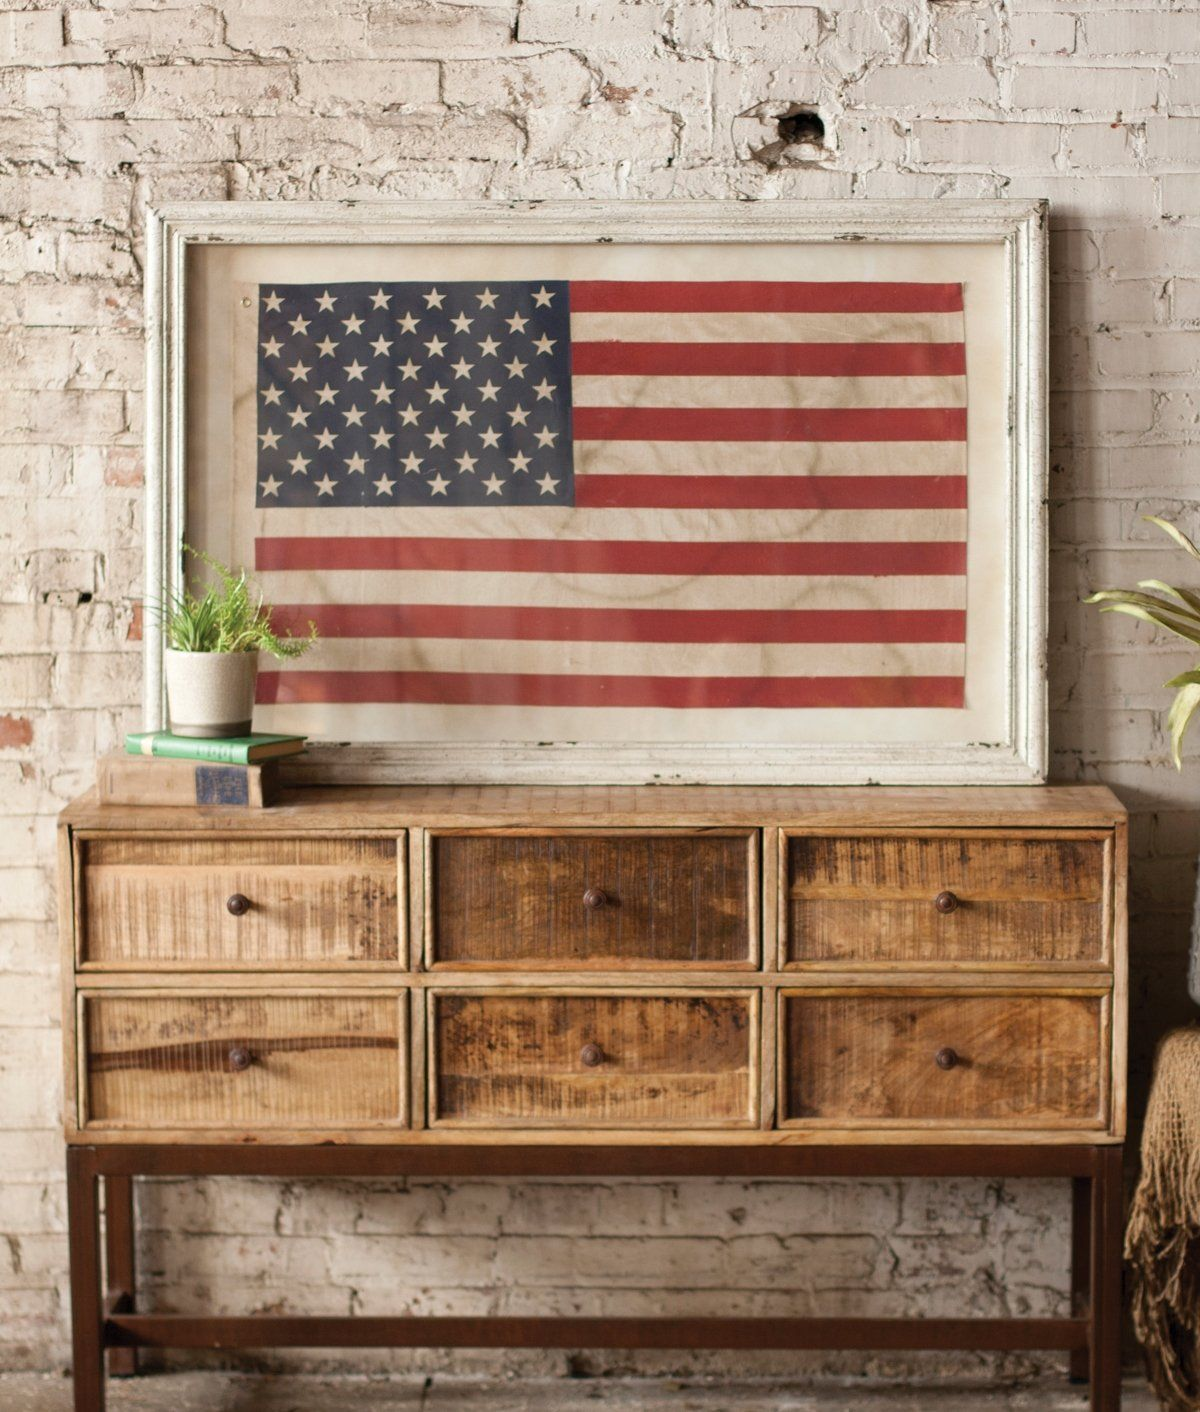 Large Framed American Flag